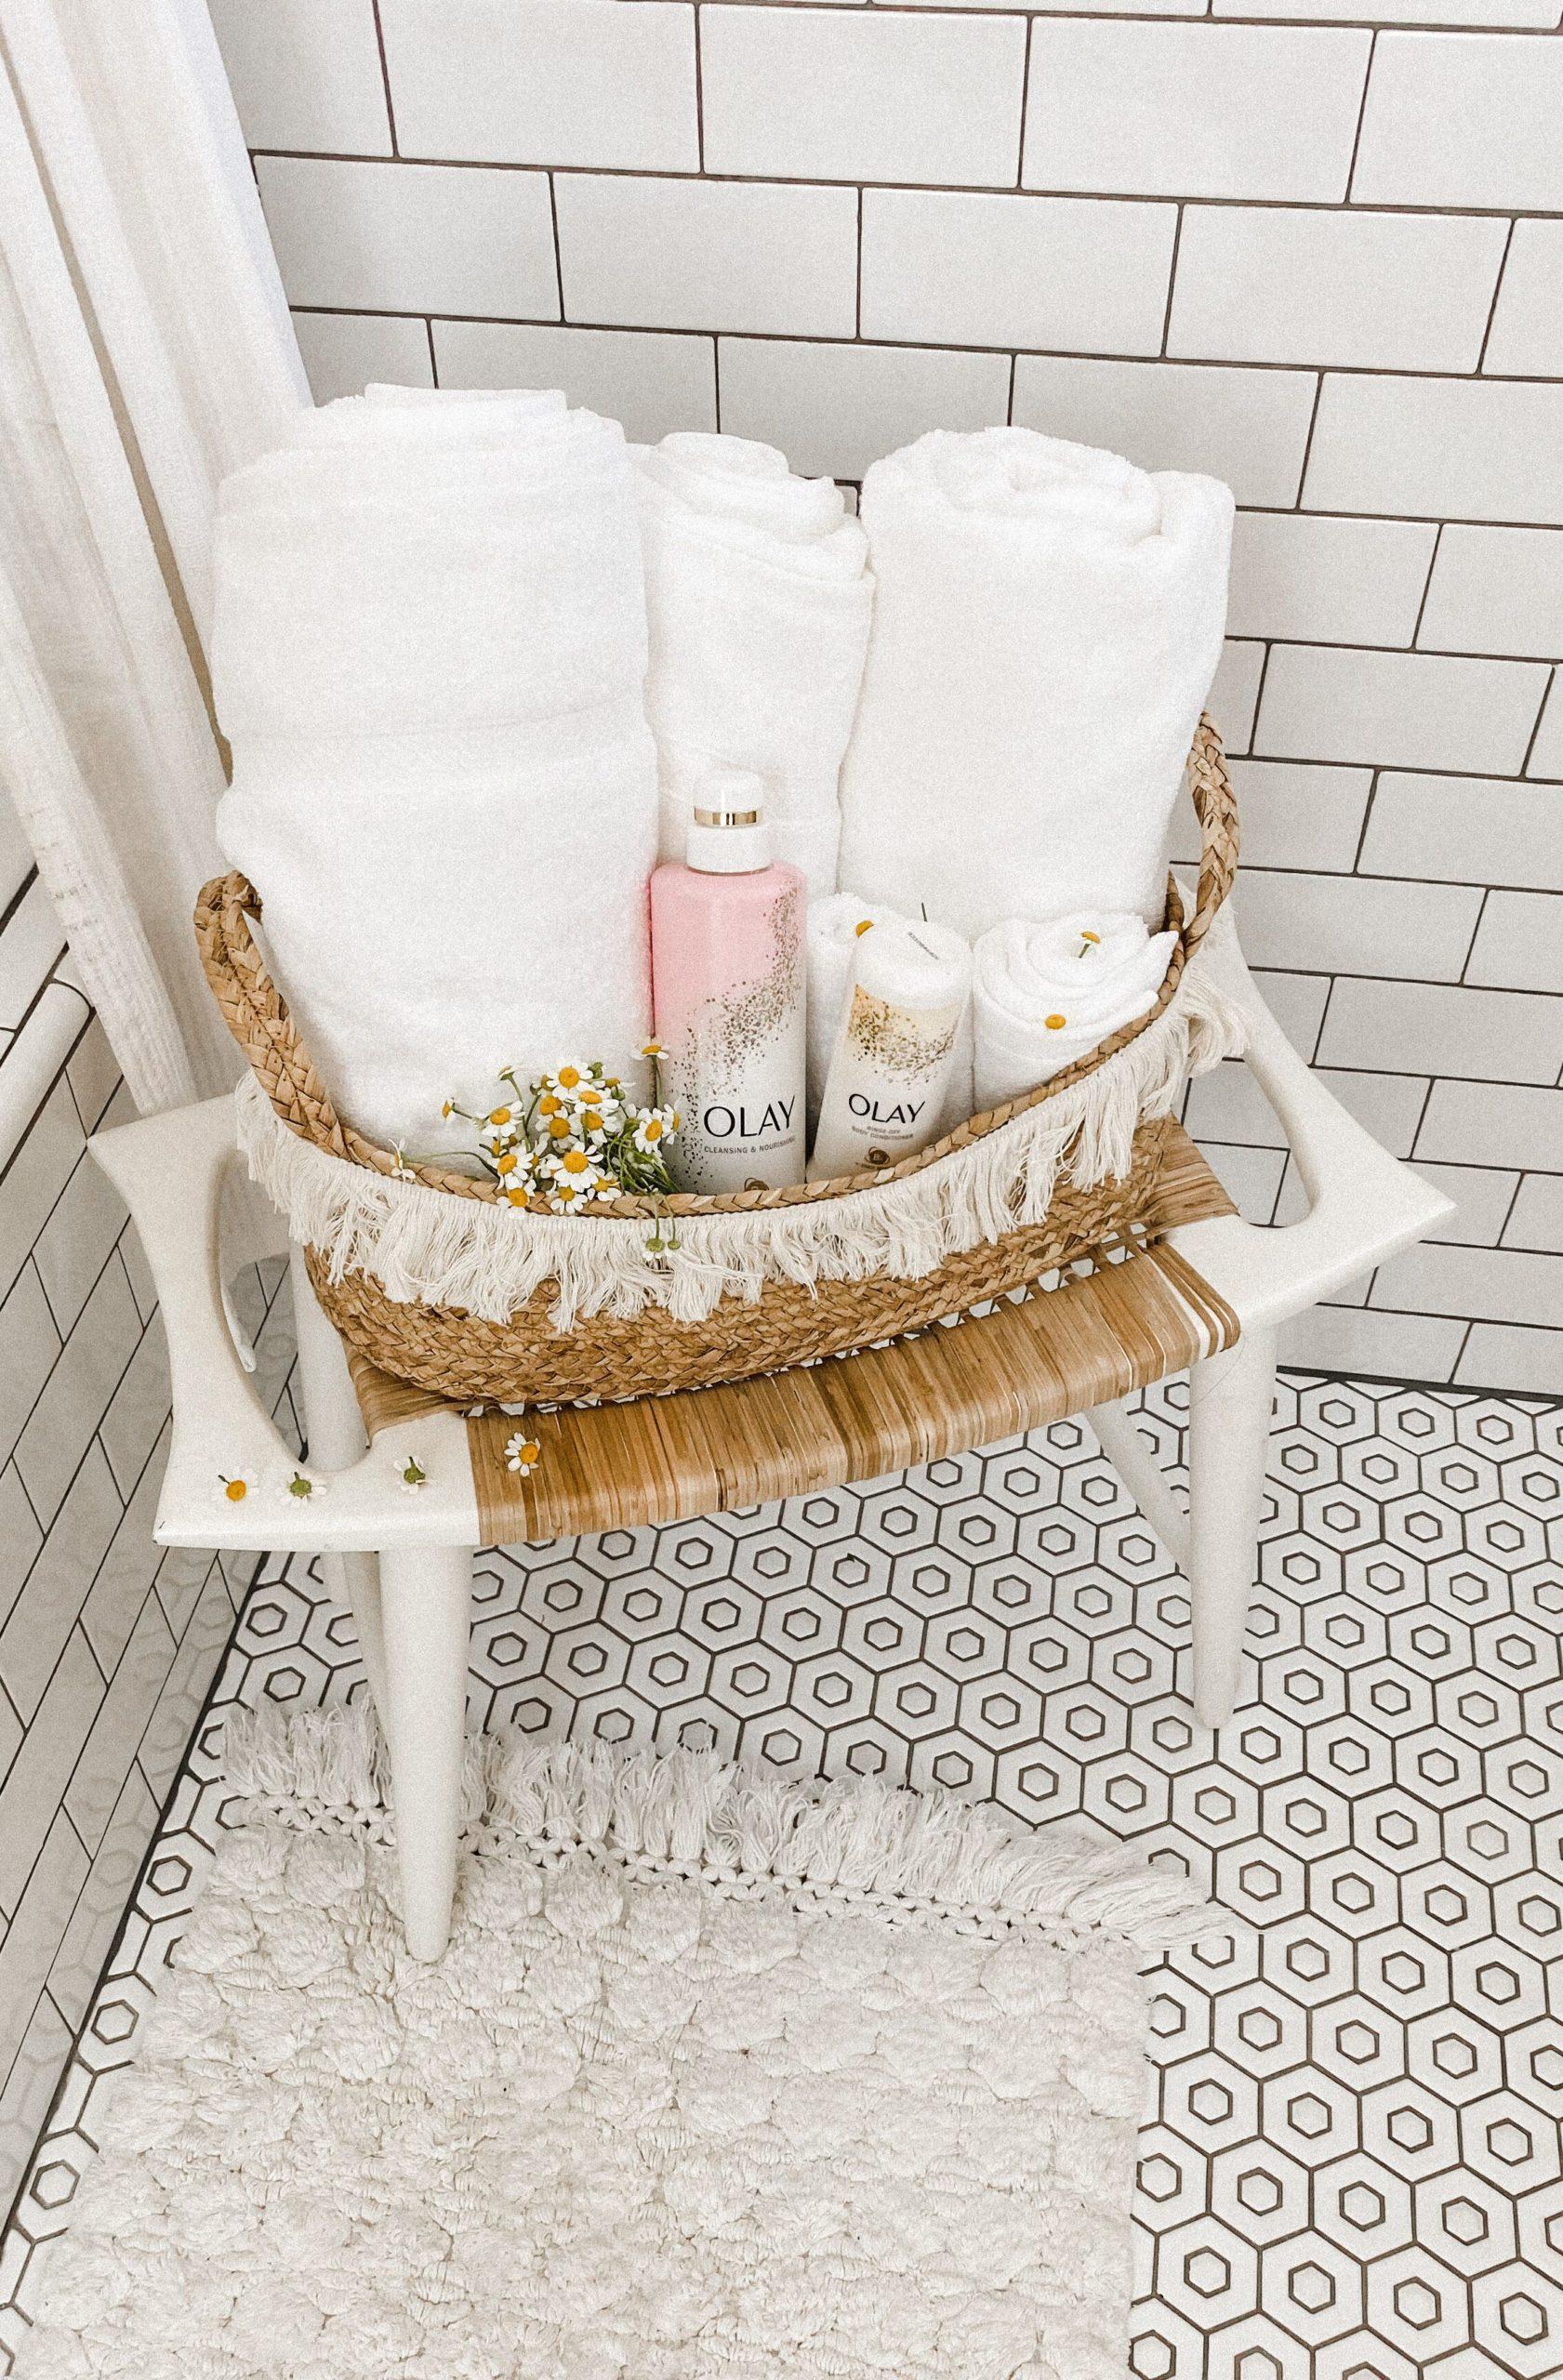 your baths routine just got better